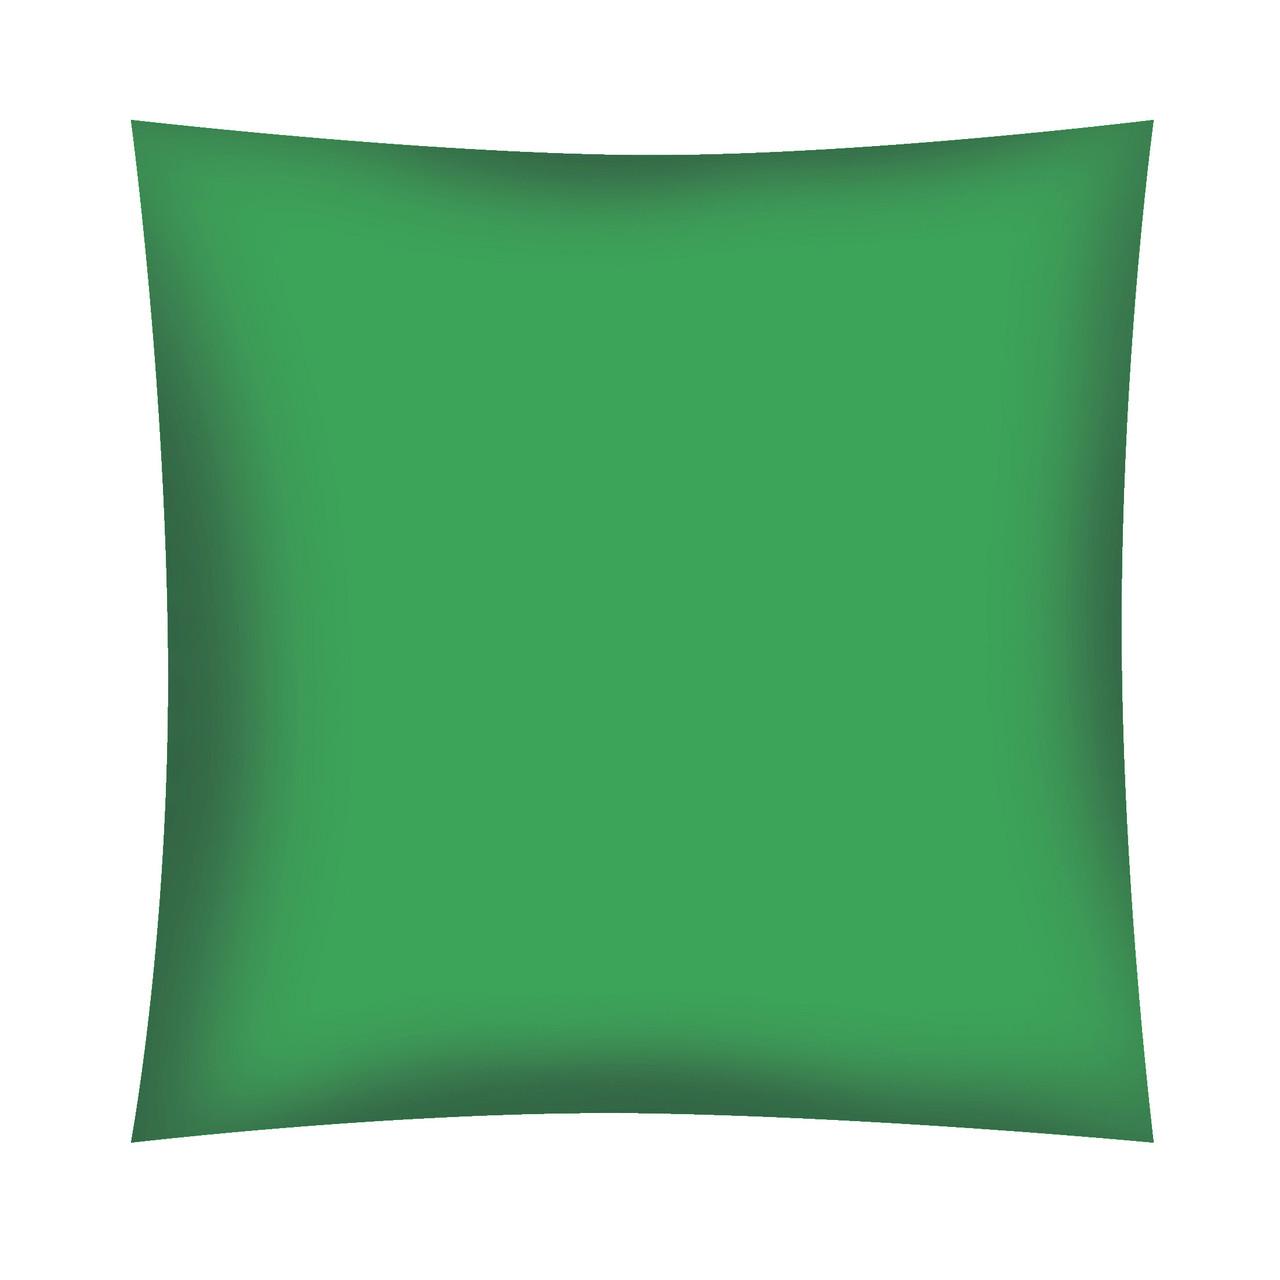 Однотонная Зеленая бязь (Польша!)